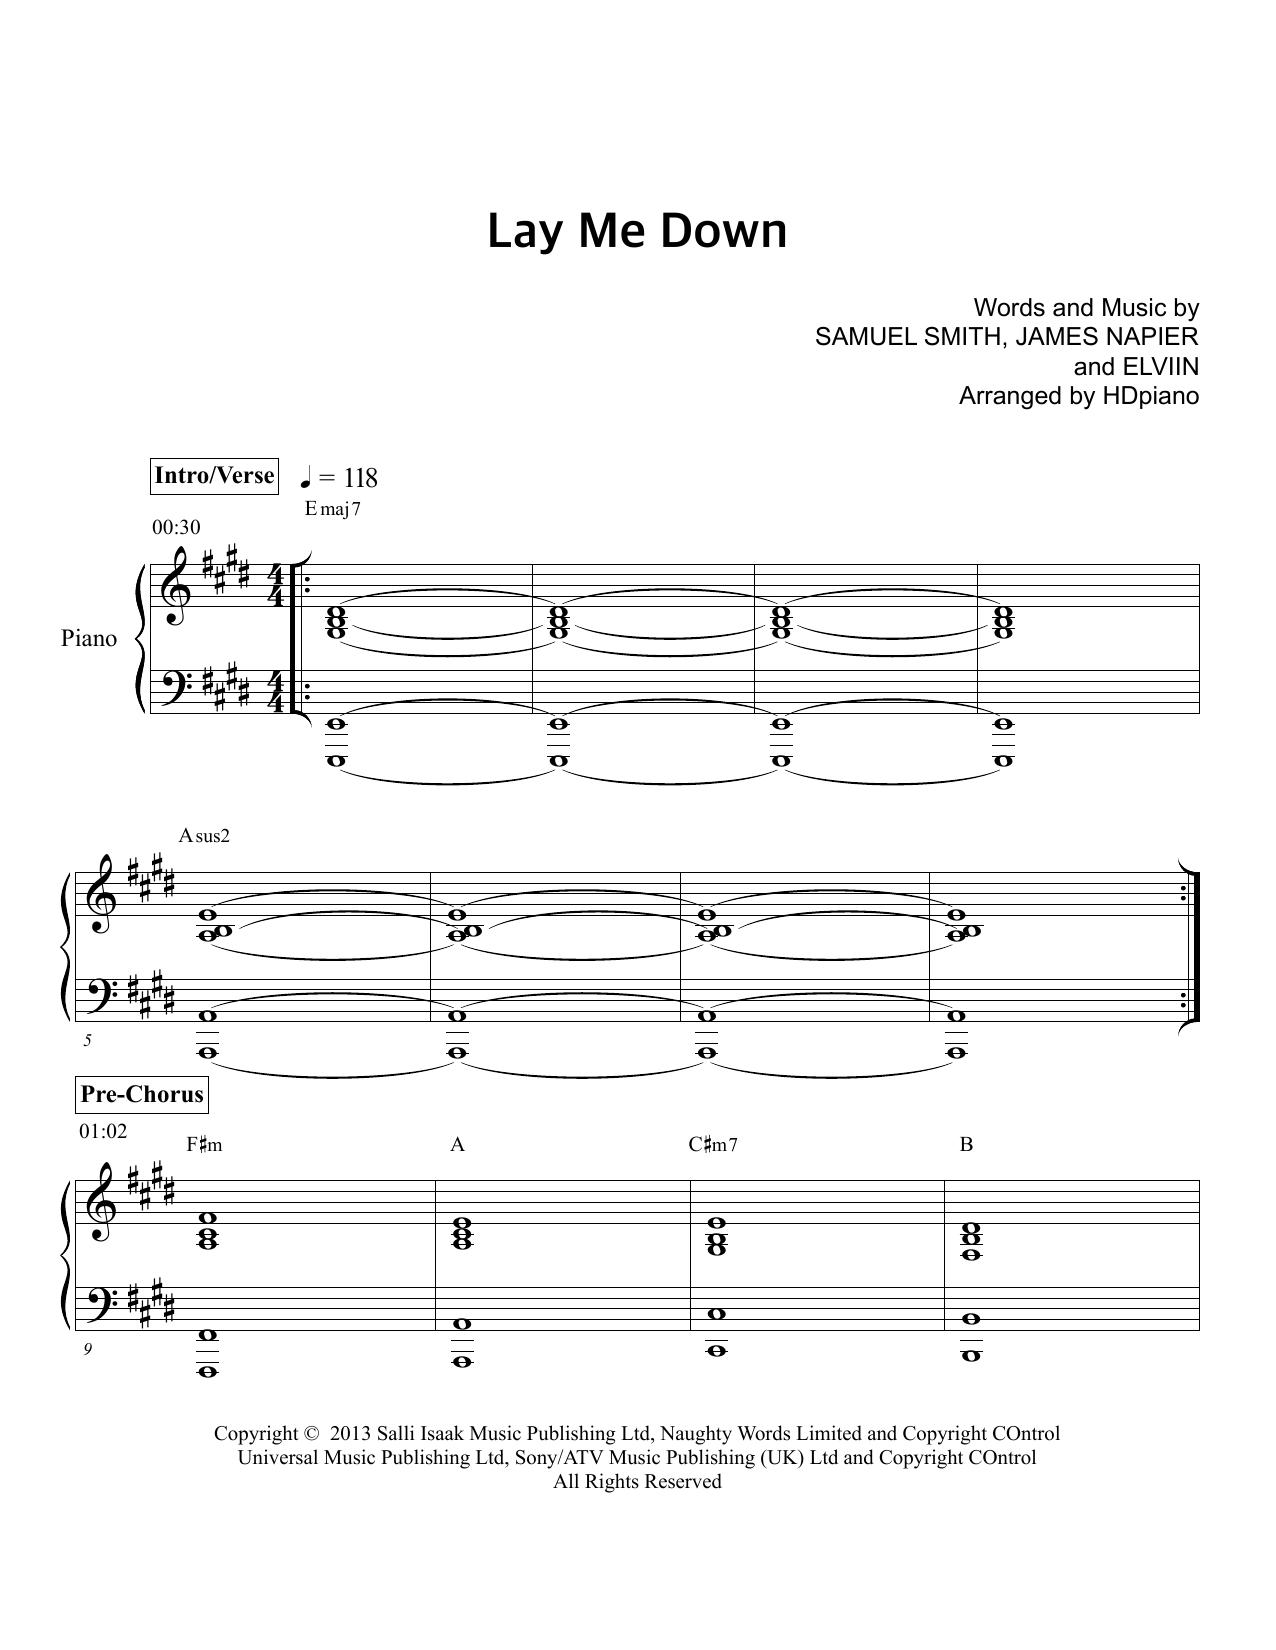 Lay Me Down Sam Smith Guitar Chords Sam Smith Lay Me Down